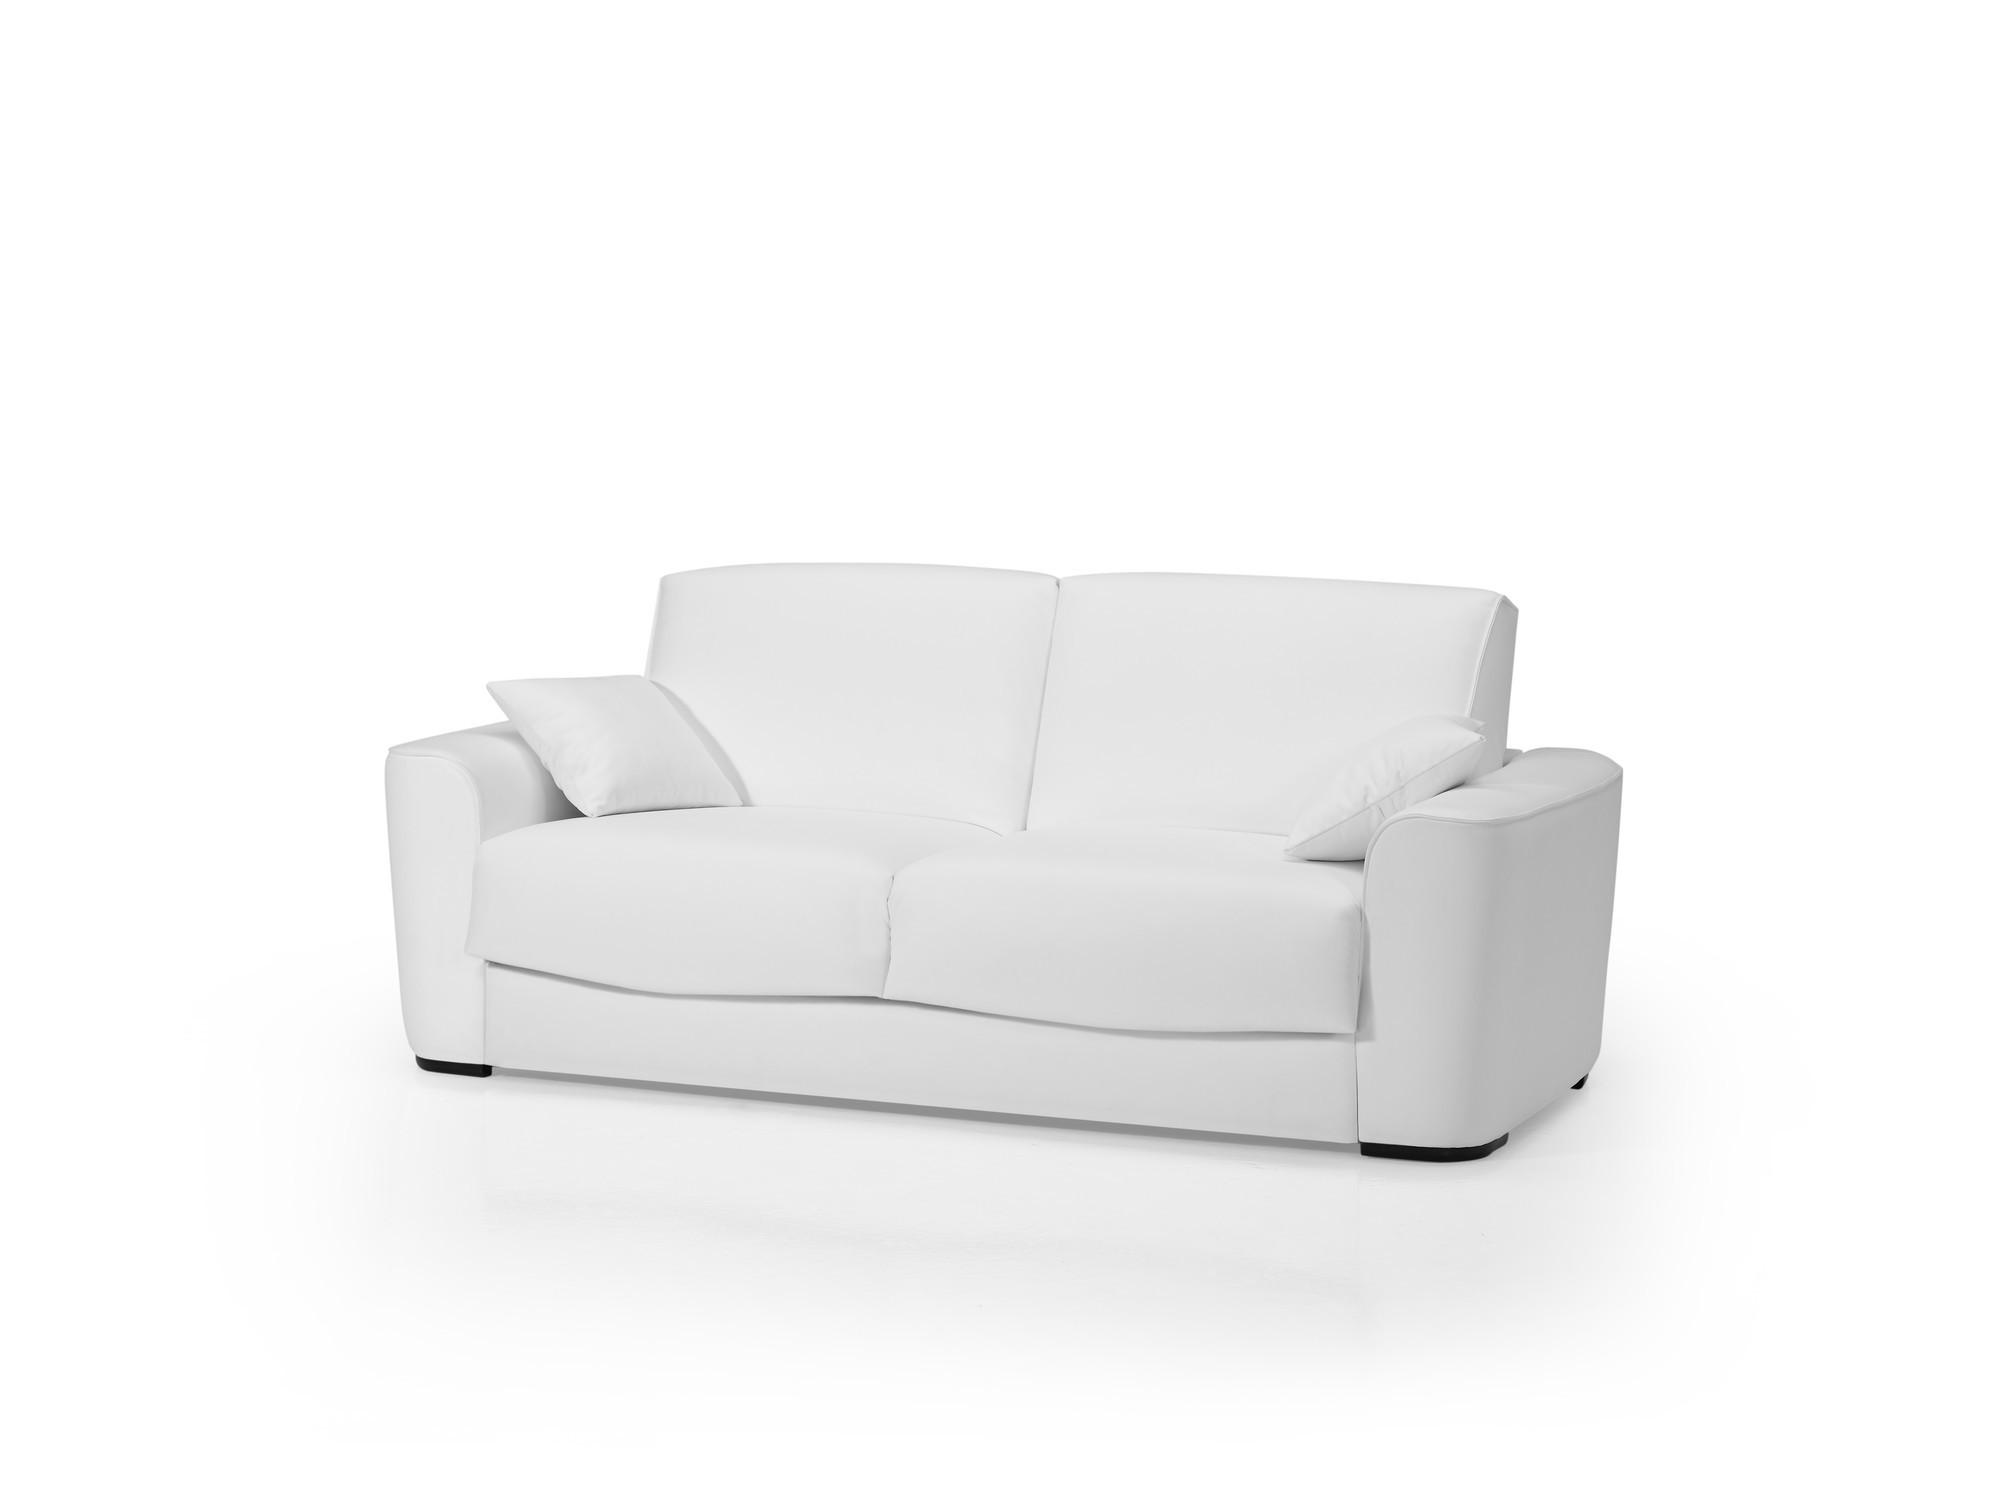 Canape Convertible Simili Cuir Blanc